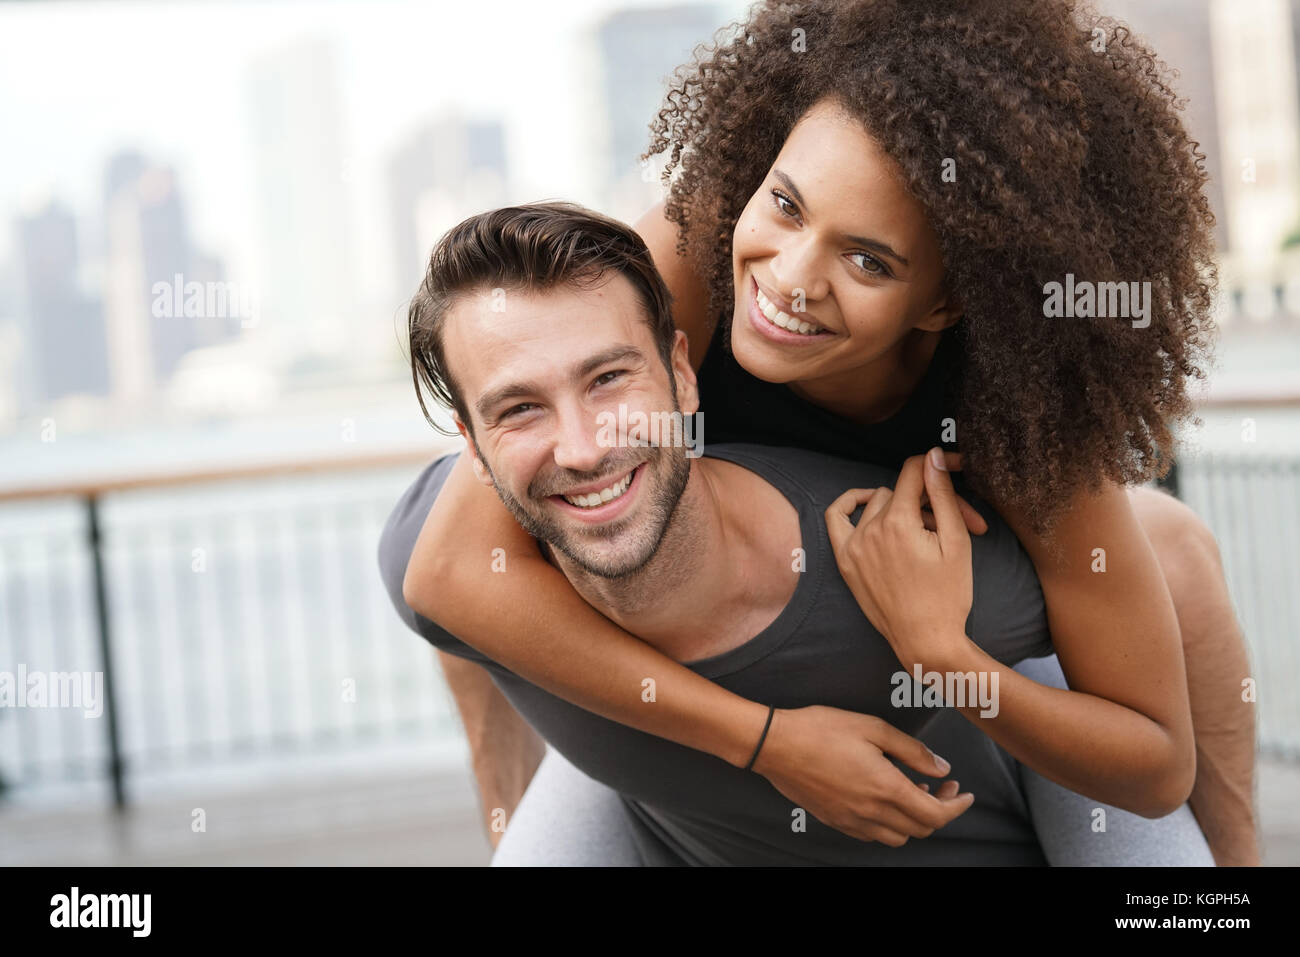 Man giving piggyback ride to girlfriend Photo Stock